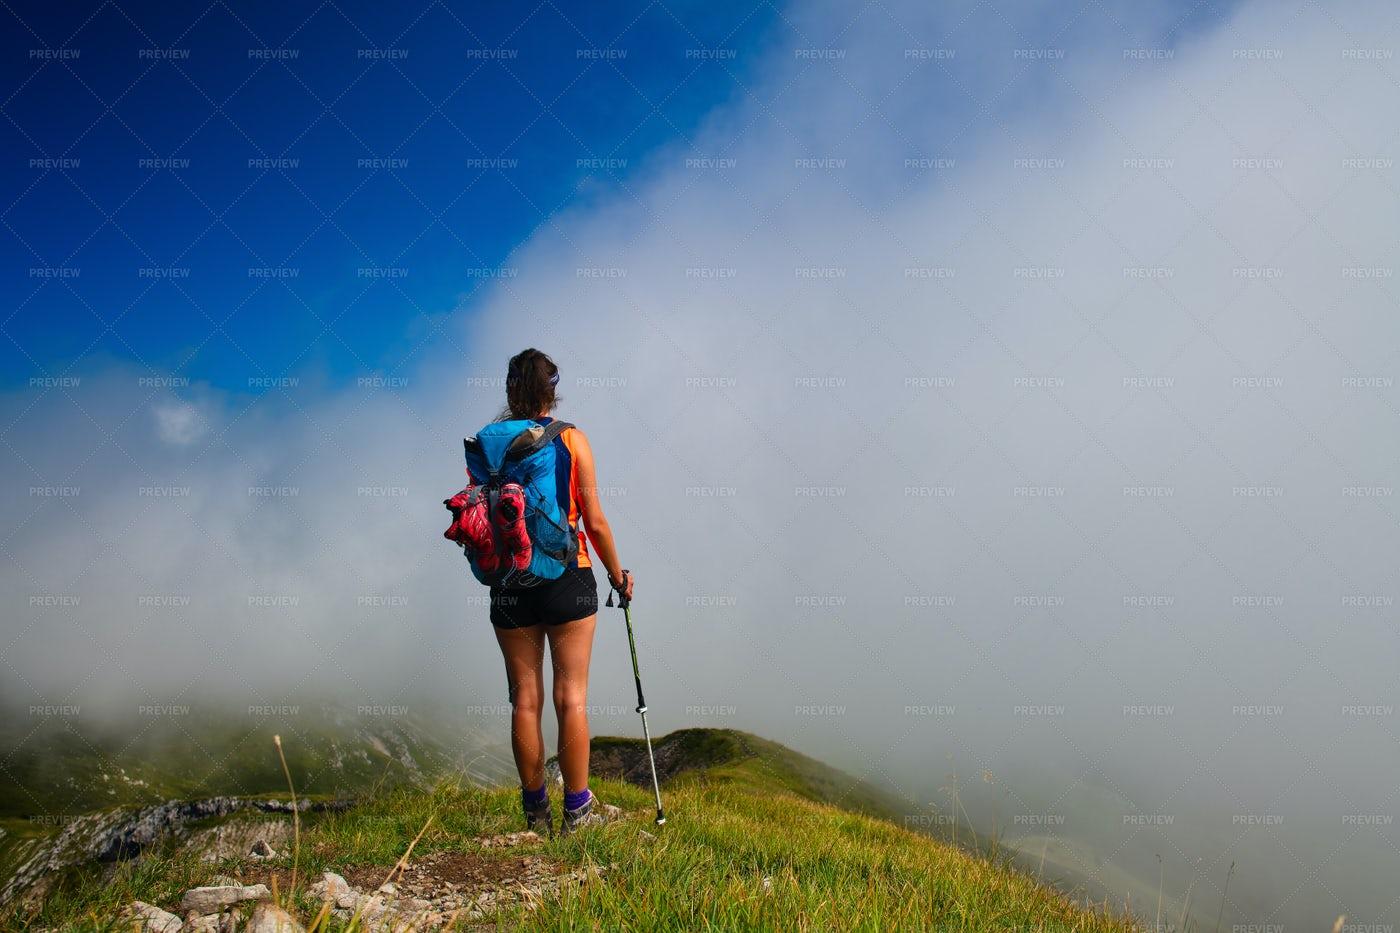 Hiker In Foggy Mountain: Stock Photos